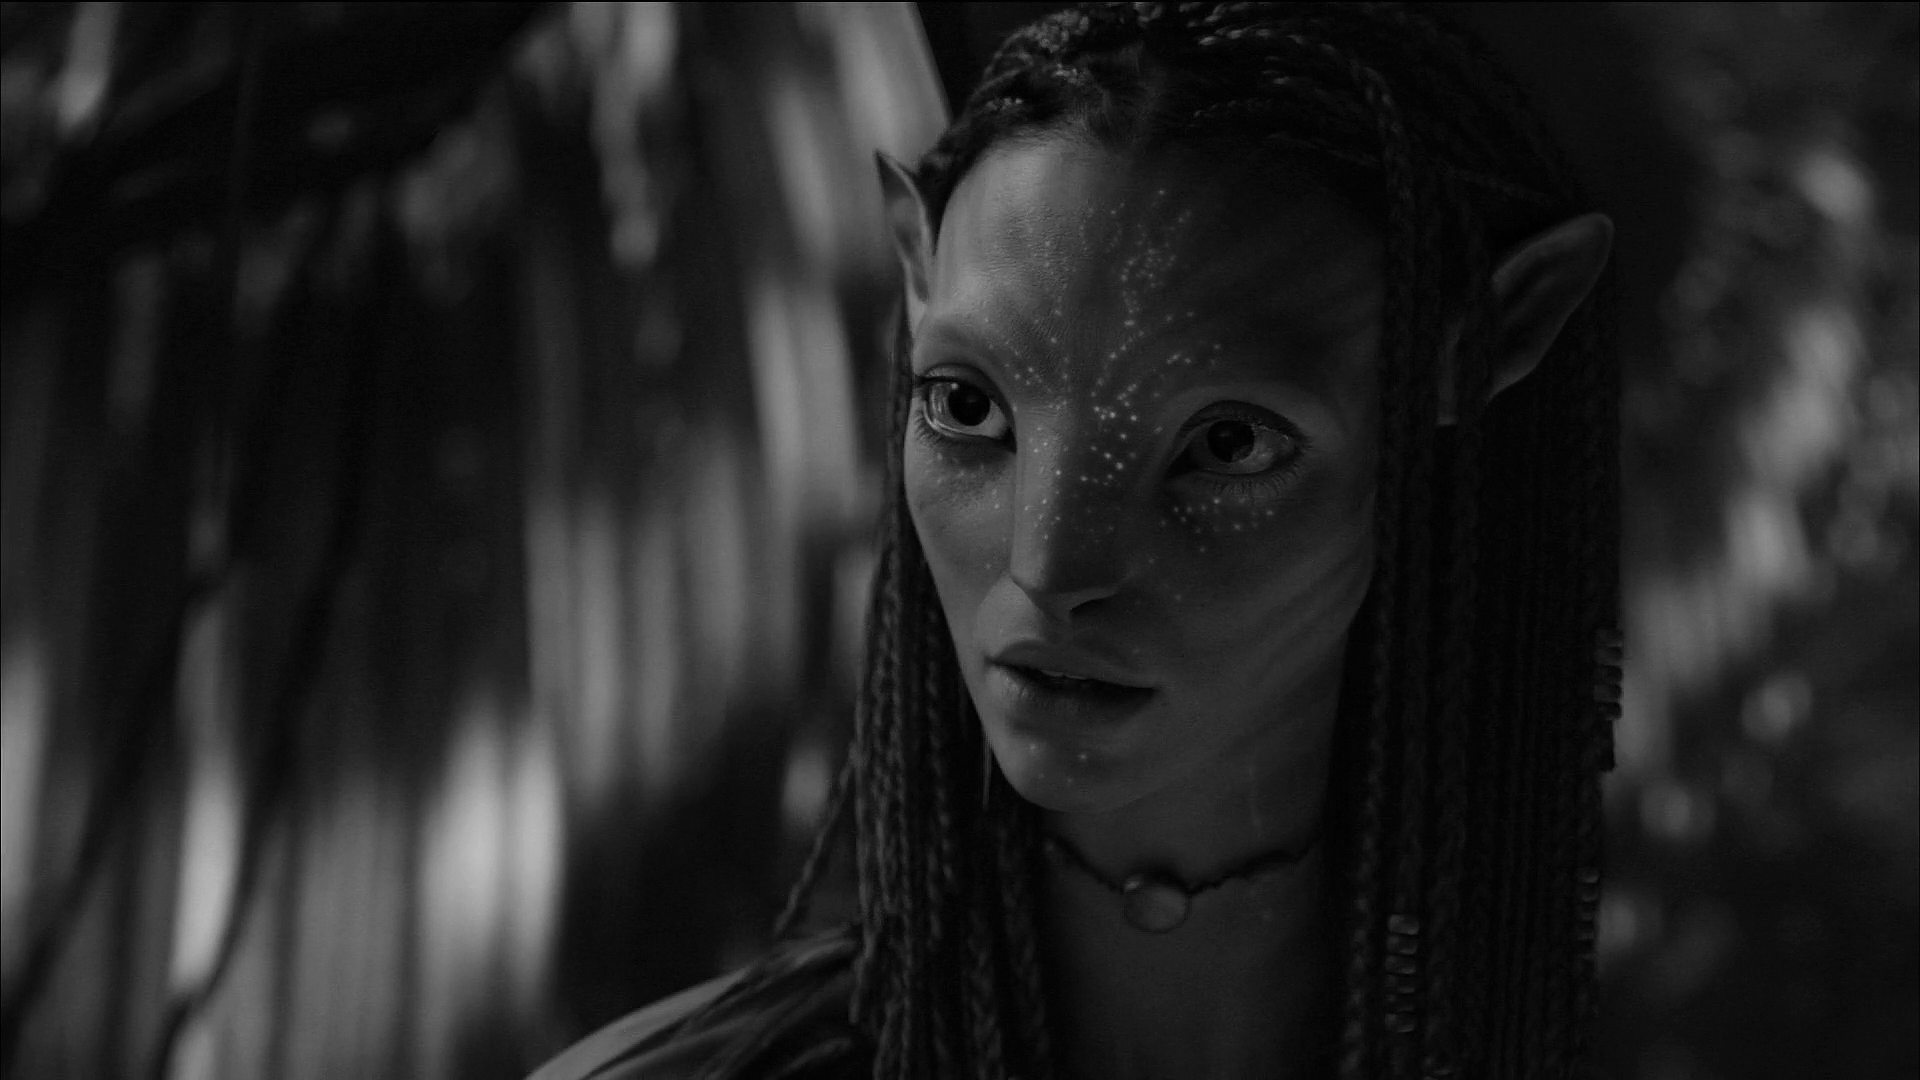 Avatar neytiri black and white by prowlerfromaf on deviantart - Black and wait ...